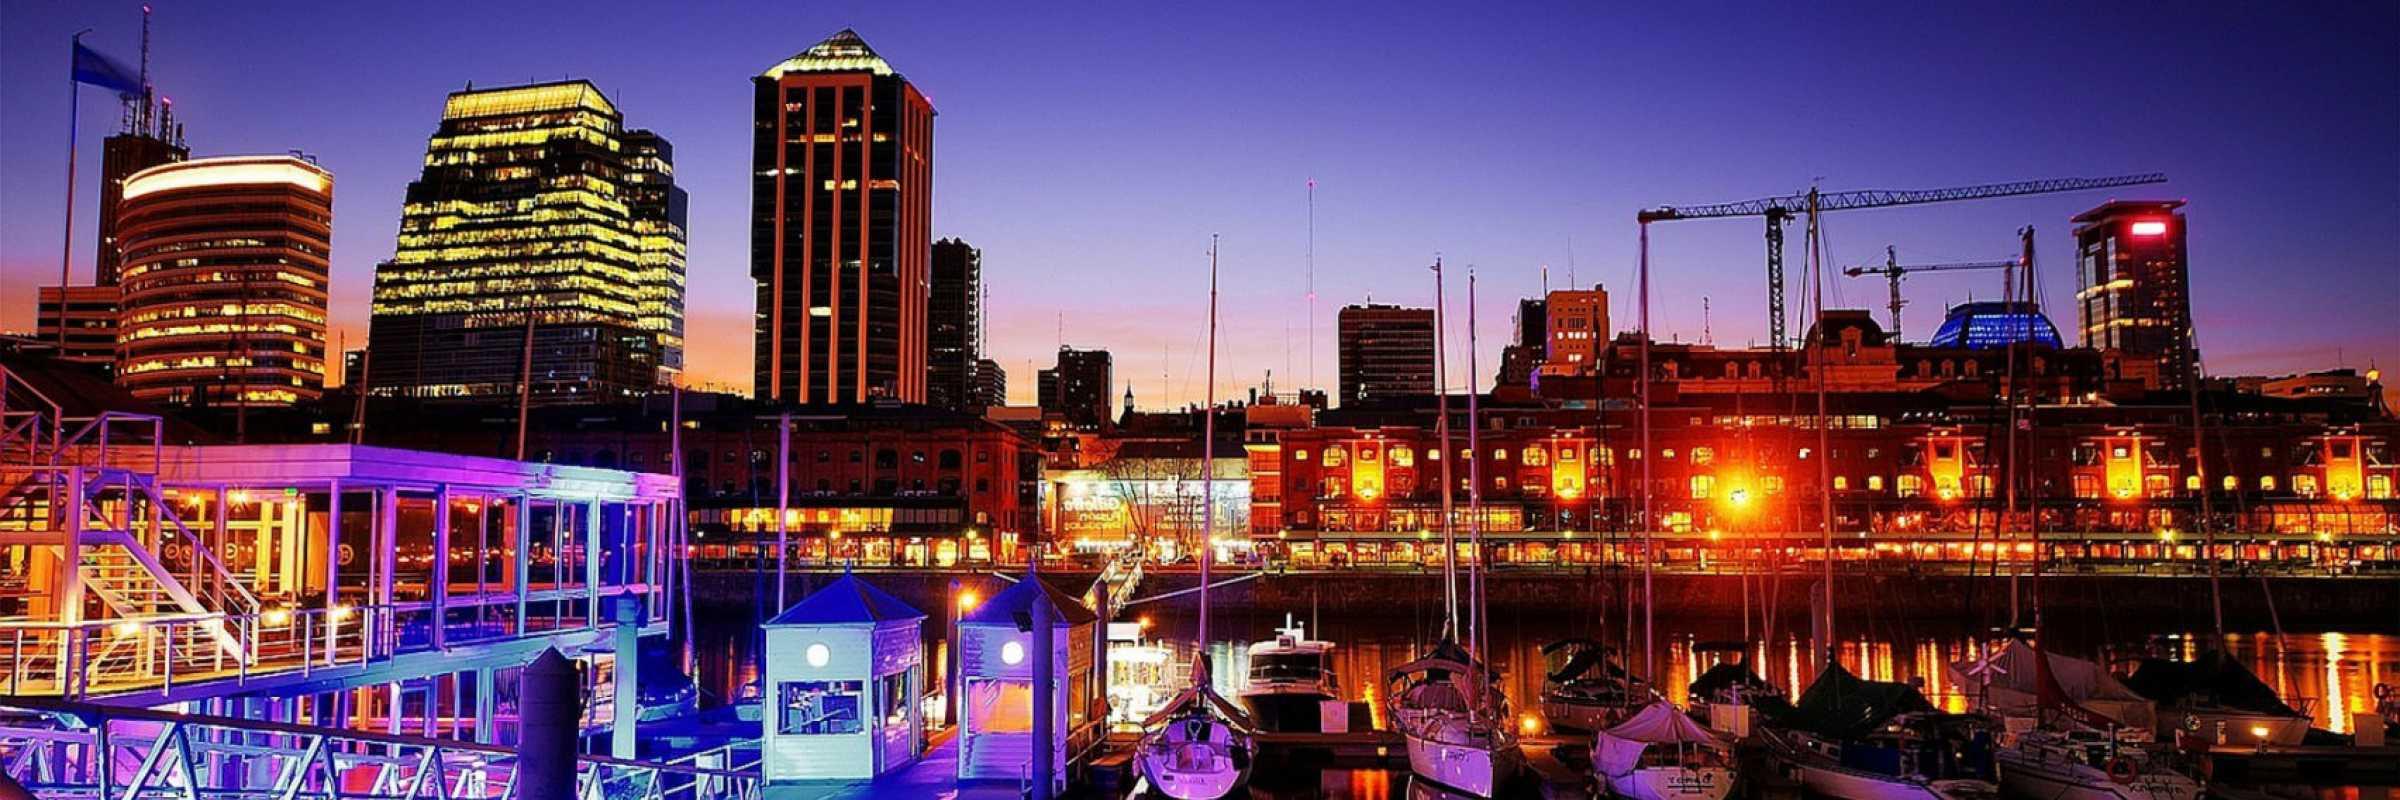 Buenos-aires, destination for IUNS Congress